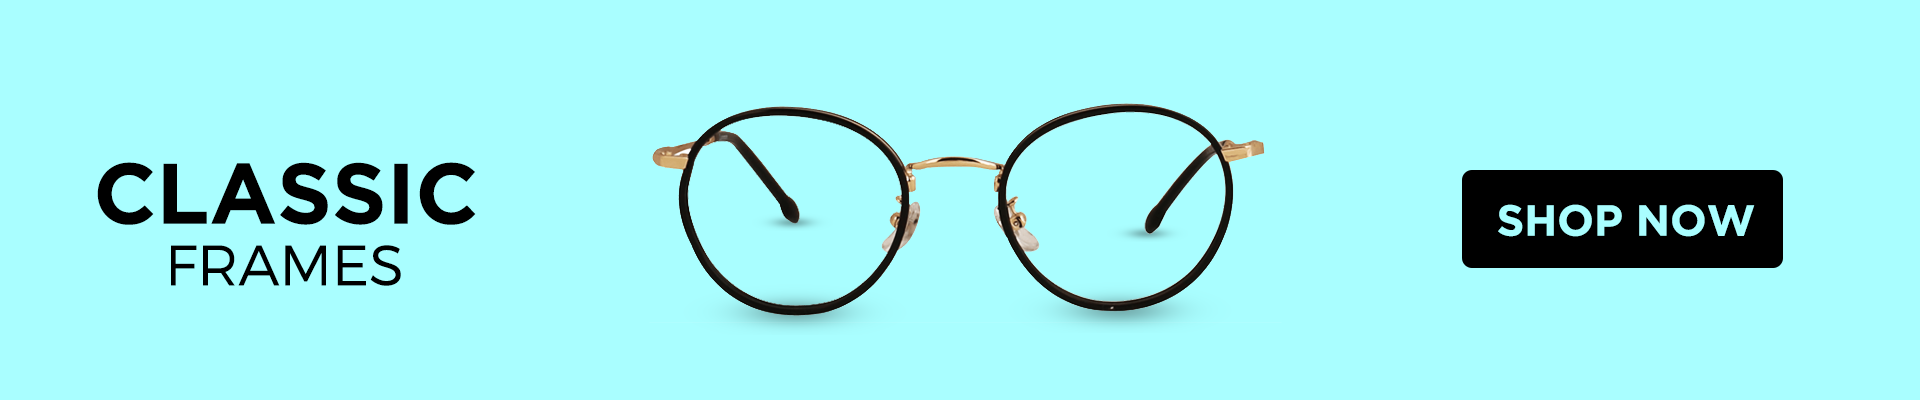 Buy Classic Eyeglasses at Goggles4U